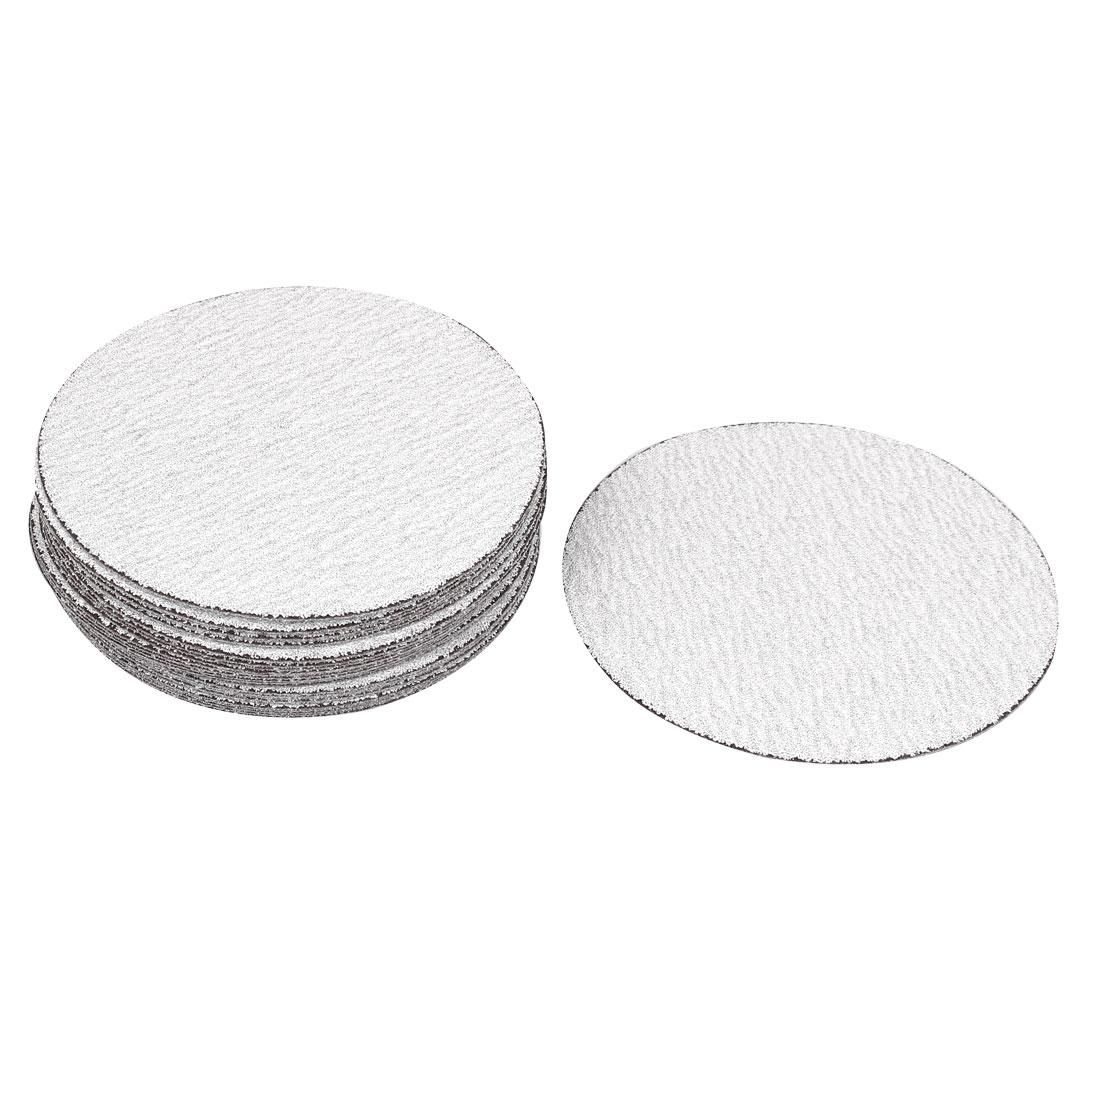 "5"" Dia Round Dry Abrasive Sanding Sandpaper Sheet Disc 120 Grit 30 Pcs"